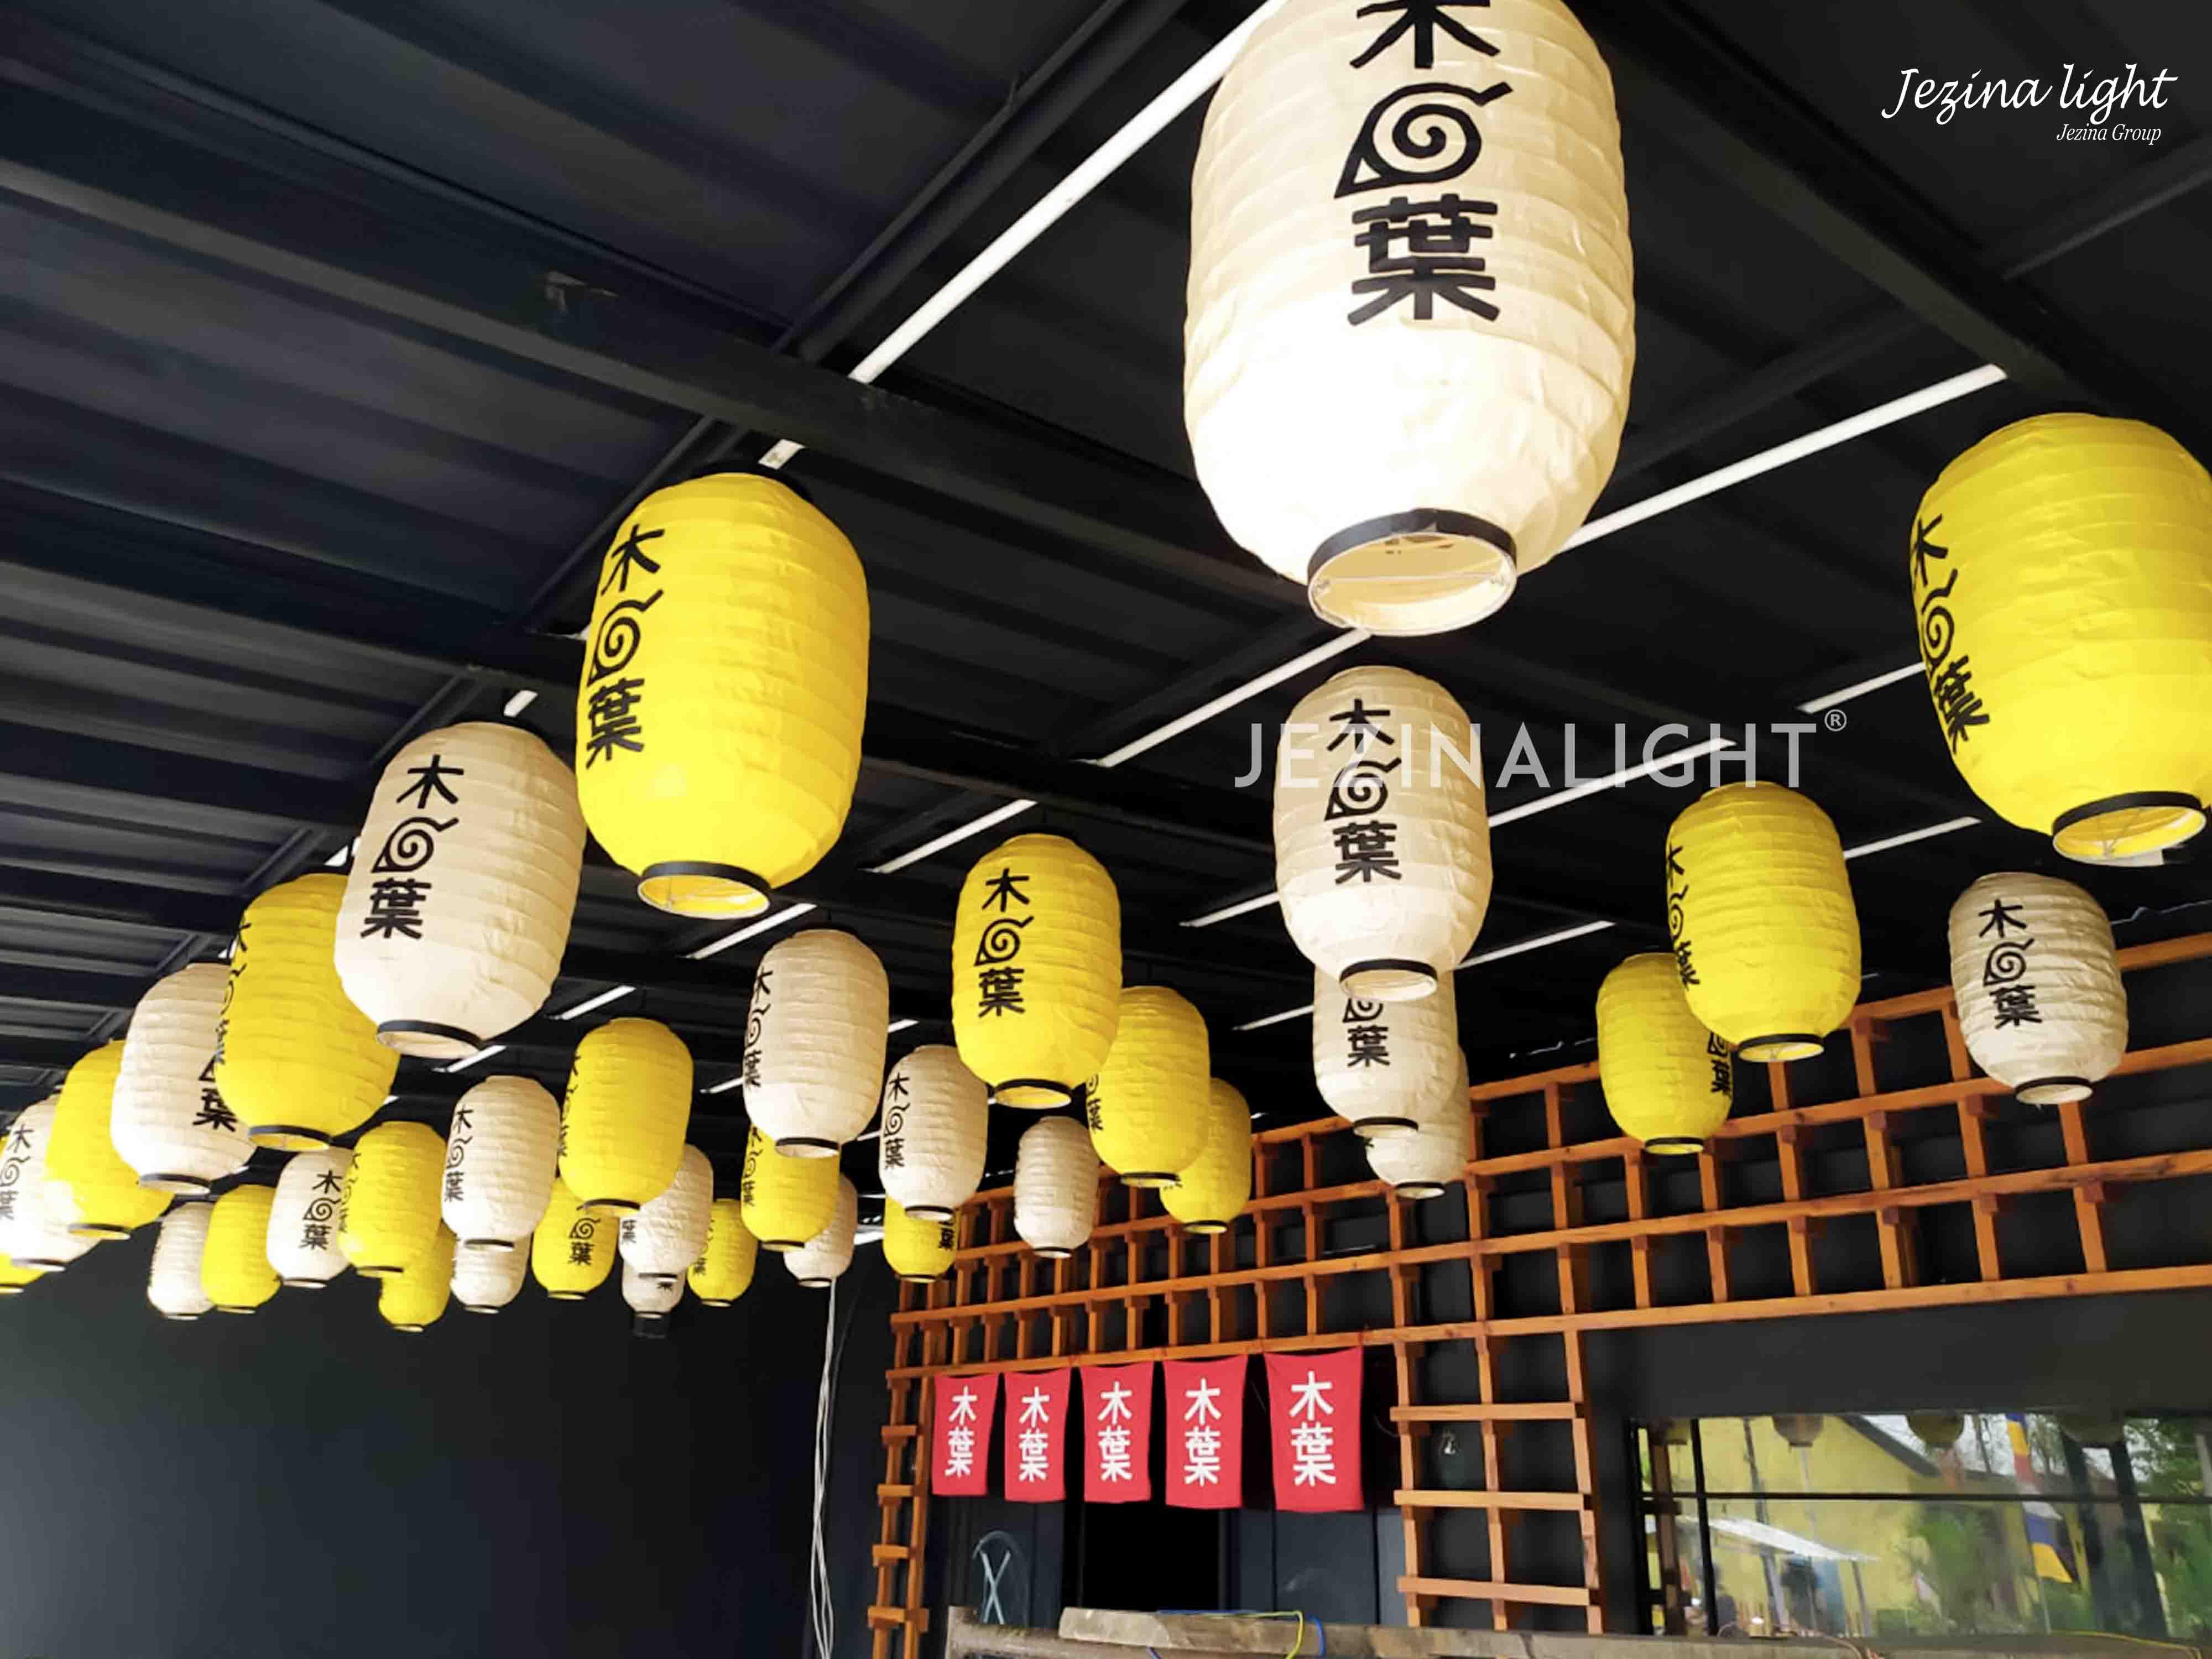 Dekorasi Restoran Jepang Bapak Ricky Bogor